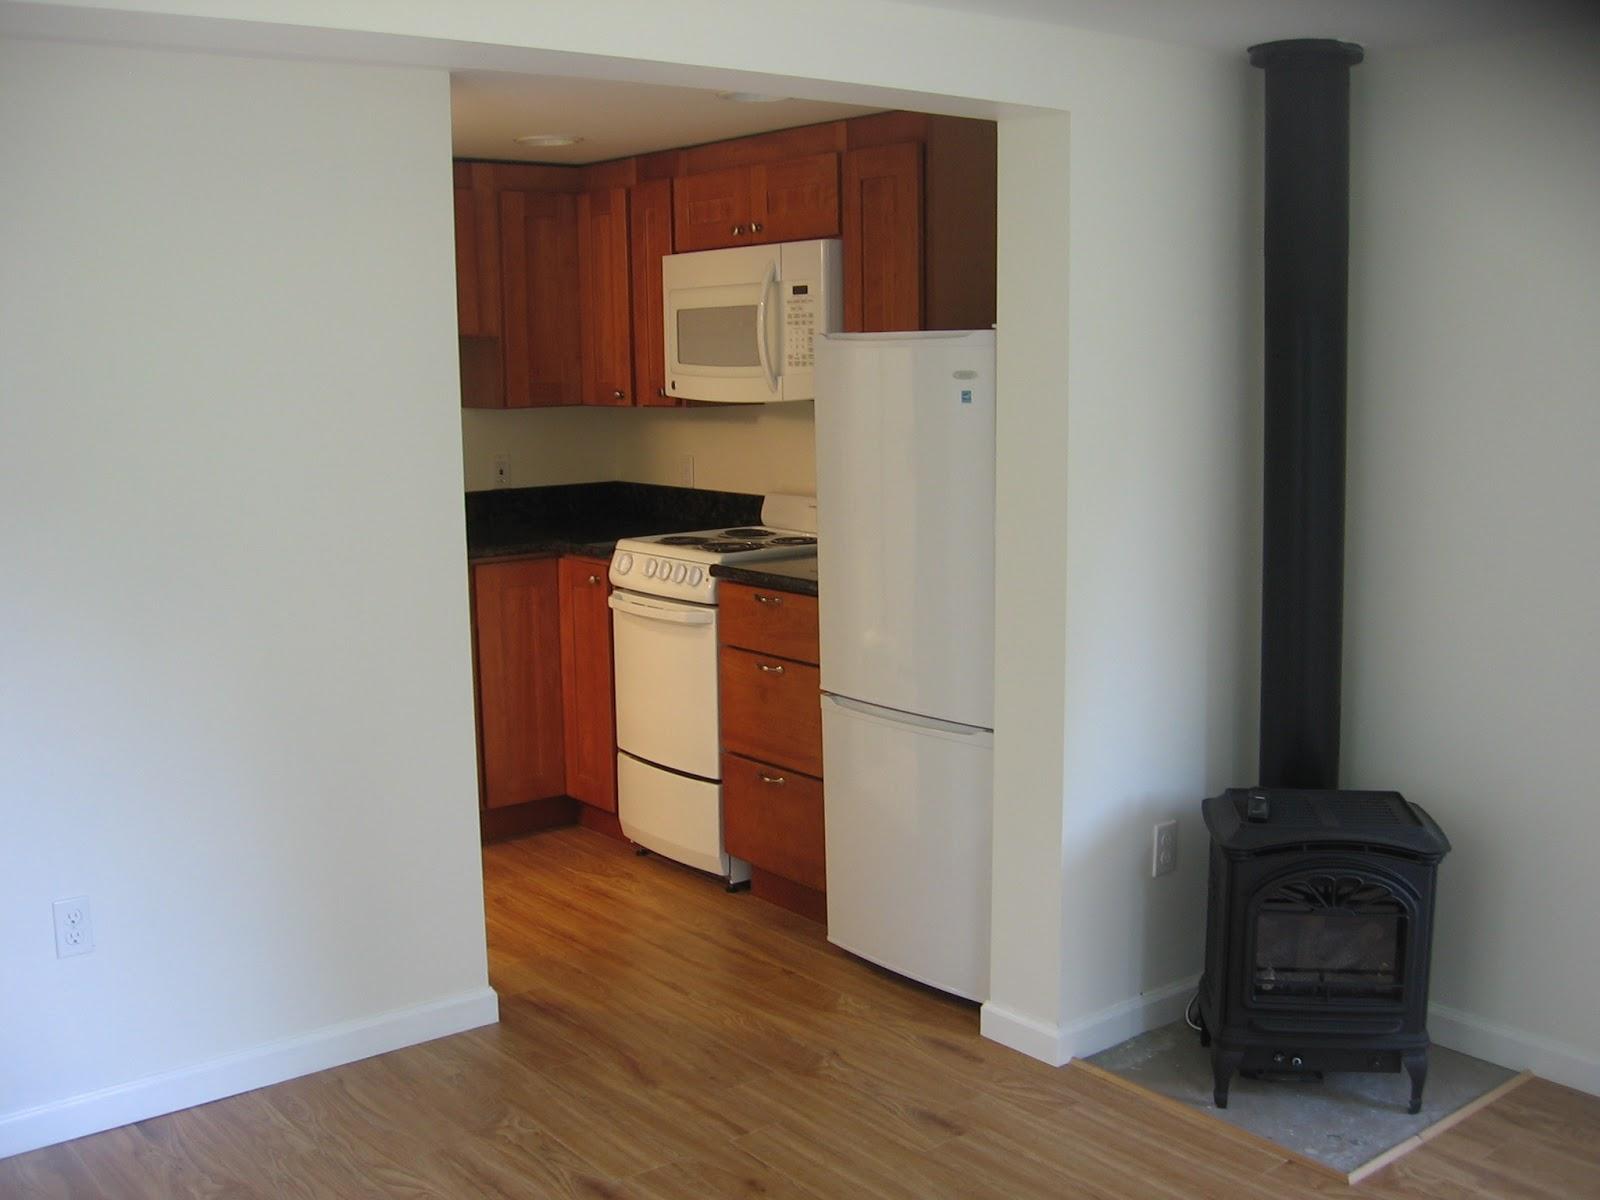 daylight basement apartment